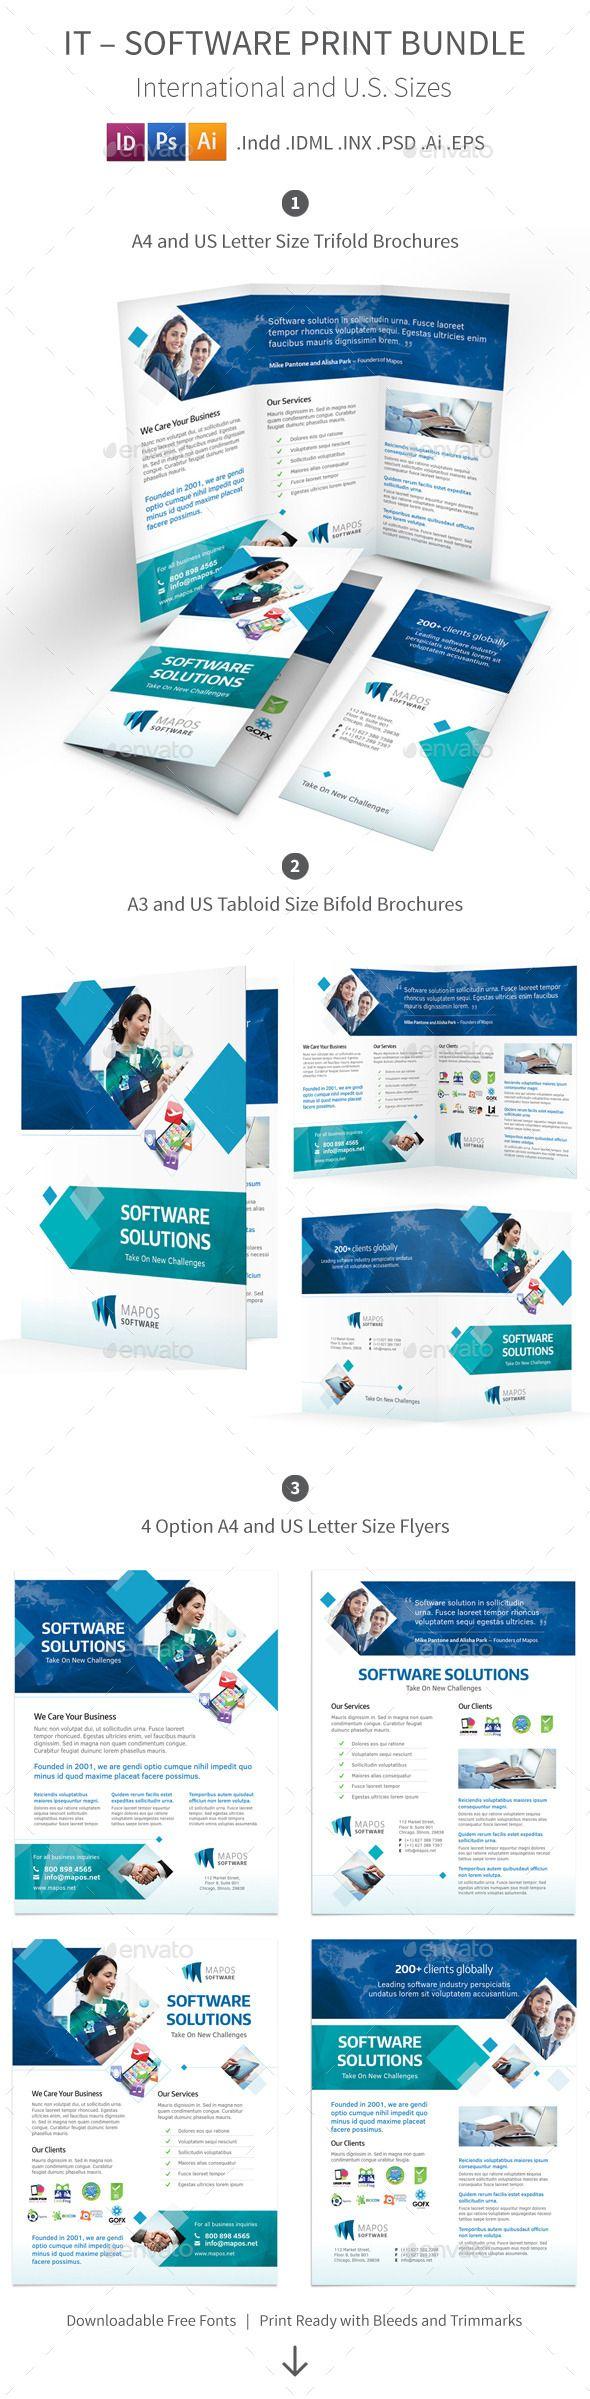 IT – Software Brochure Print Bundle Template